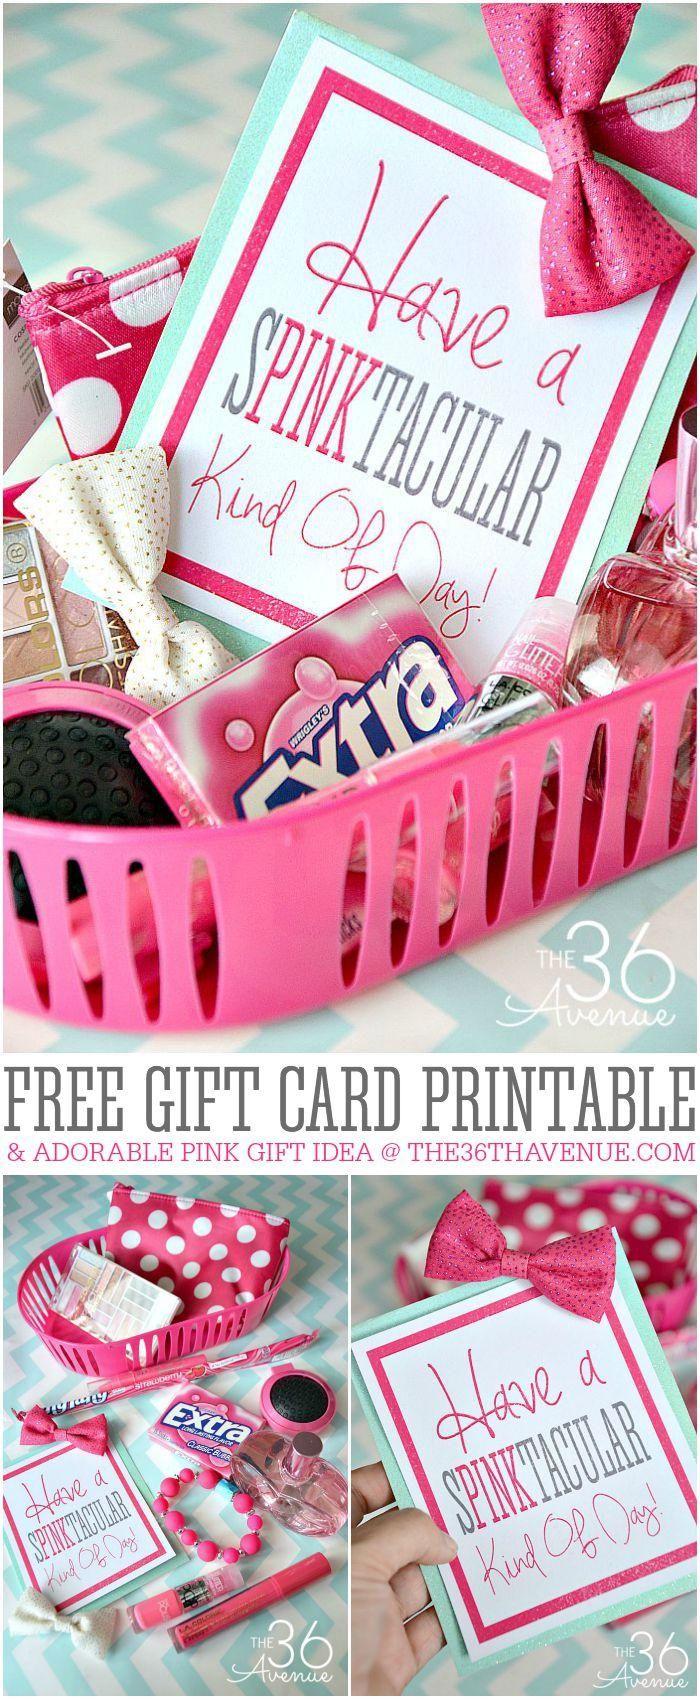 70+ Inexpensive DIY Gift Basket Ideas - DIY Gifts - Page 4 of 14 - DIY